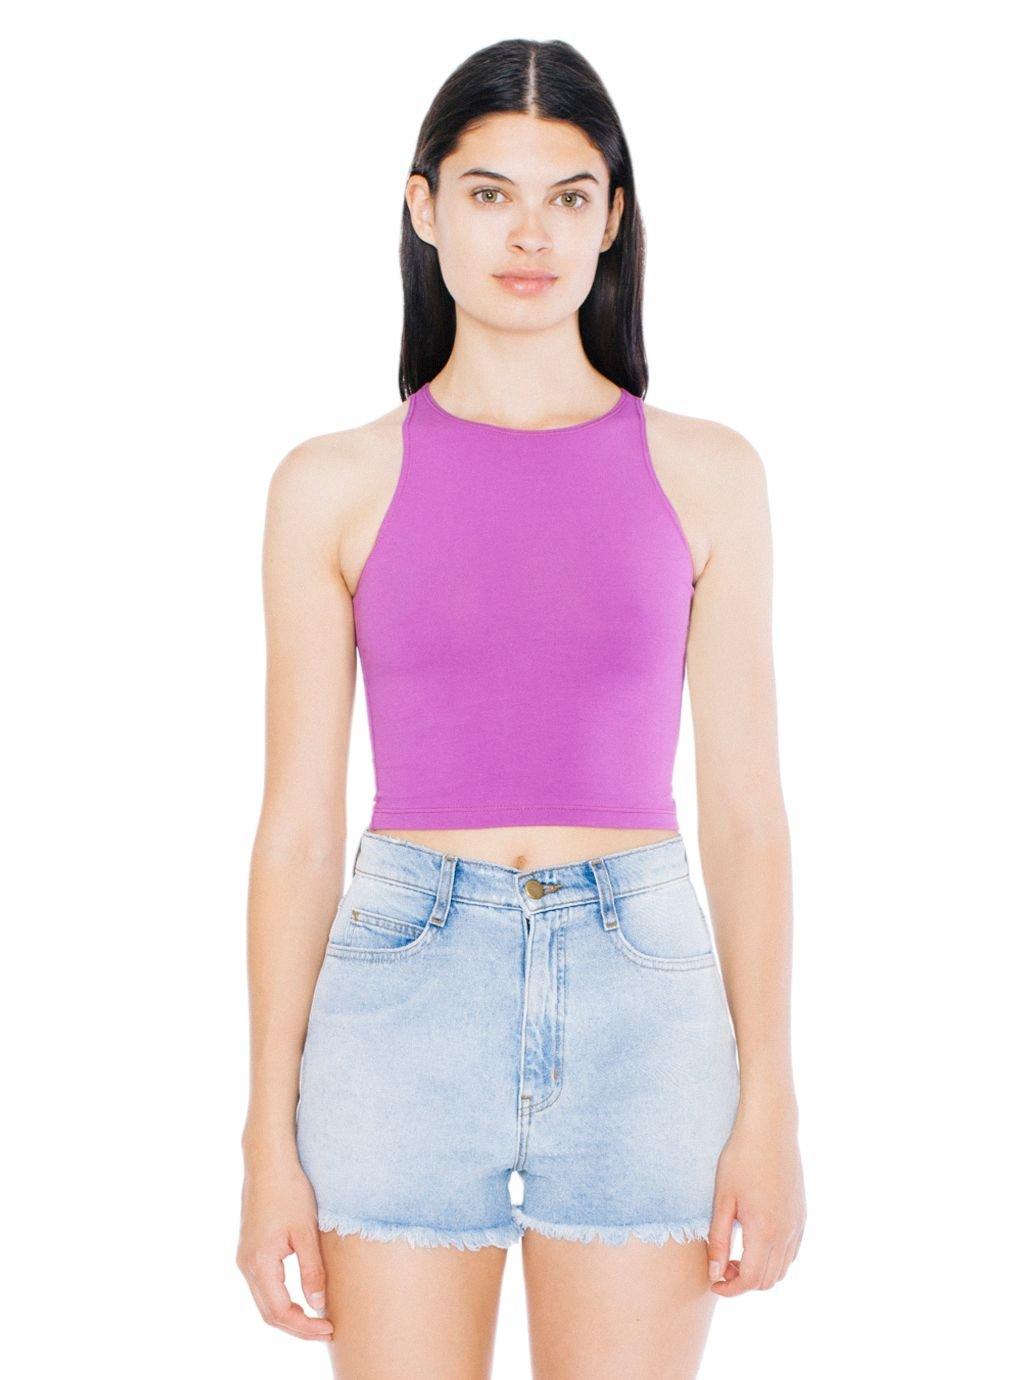 American Apparel Women's Cotton Spandex Sleeveless Crop Top Size L Boysenberry